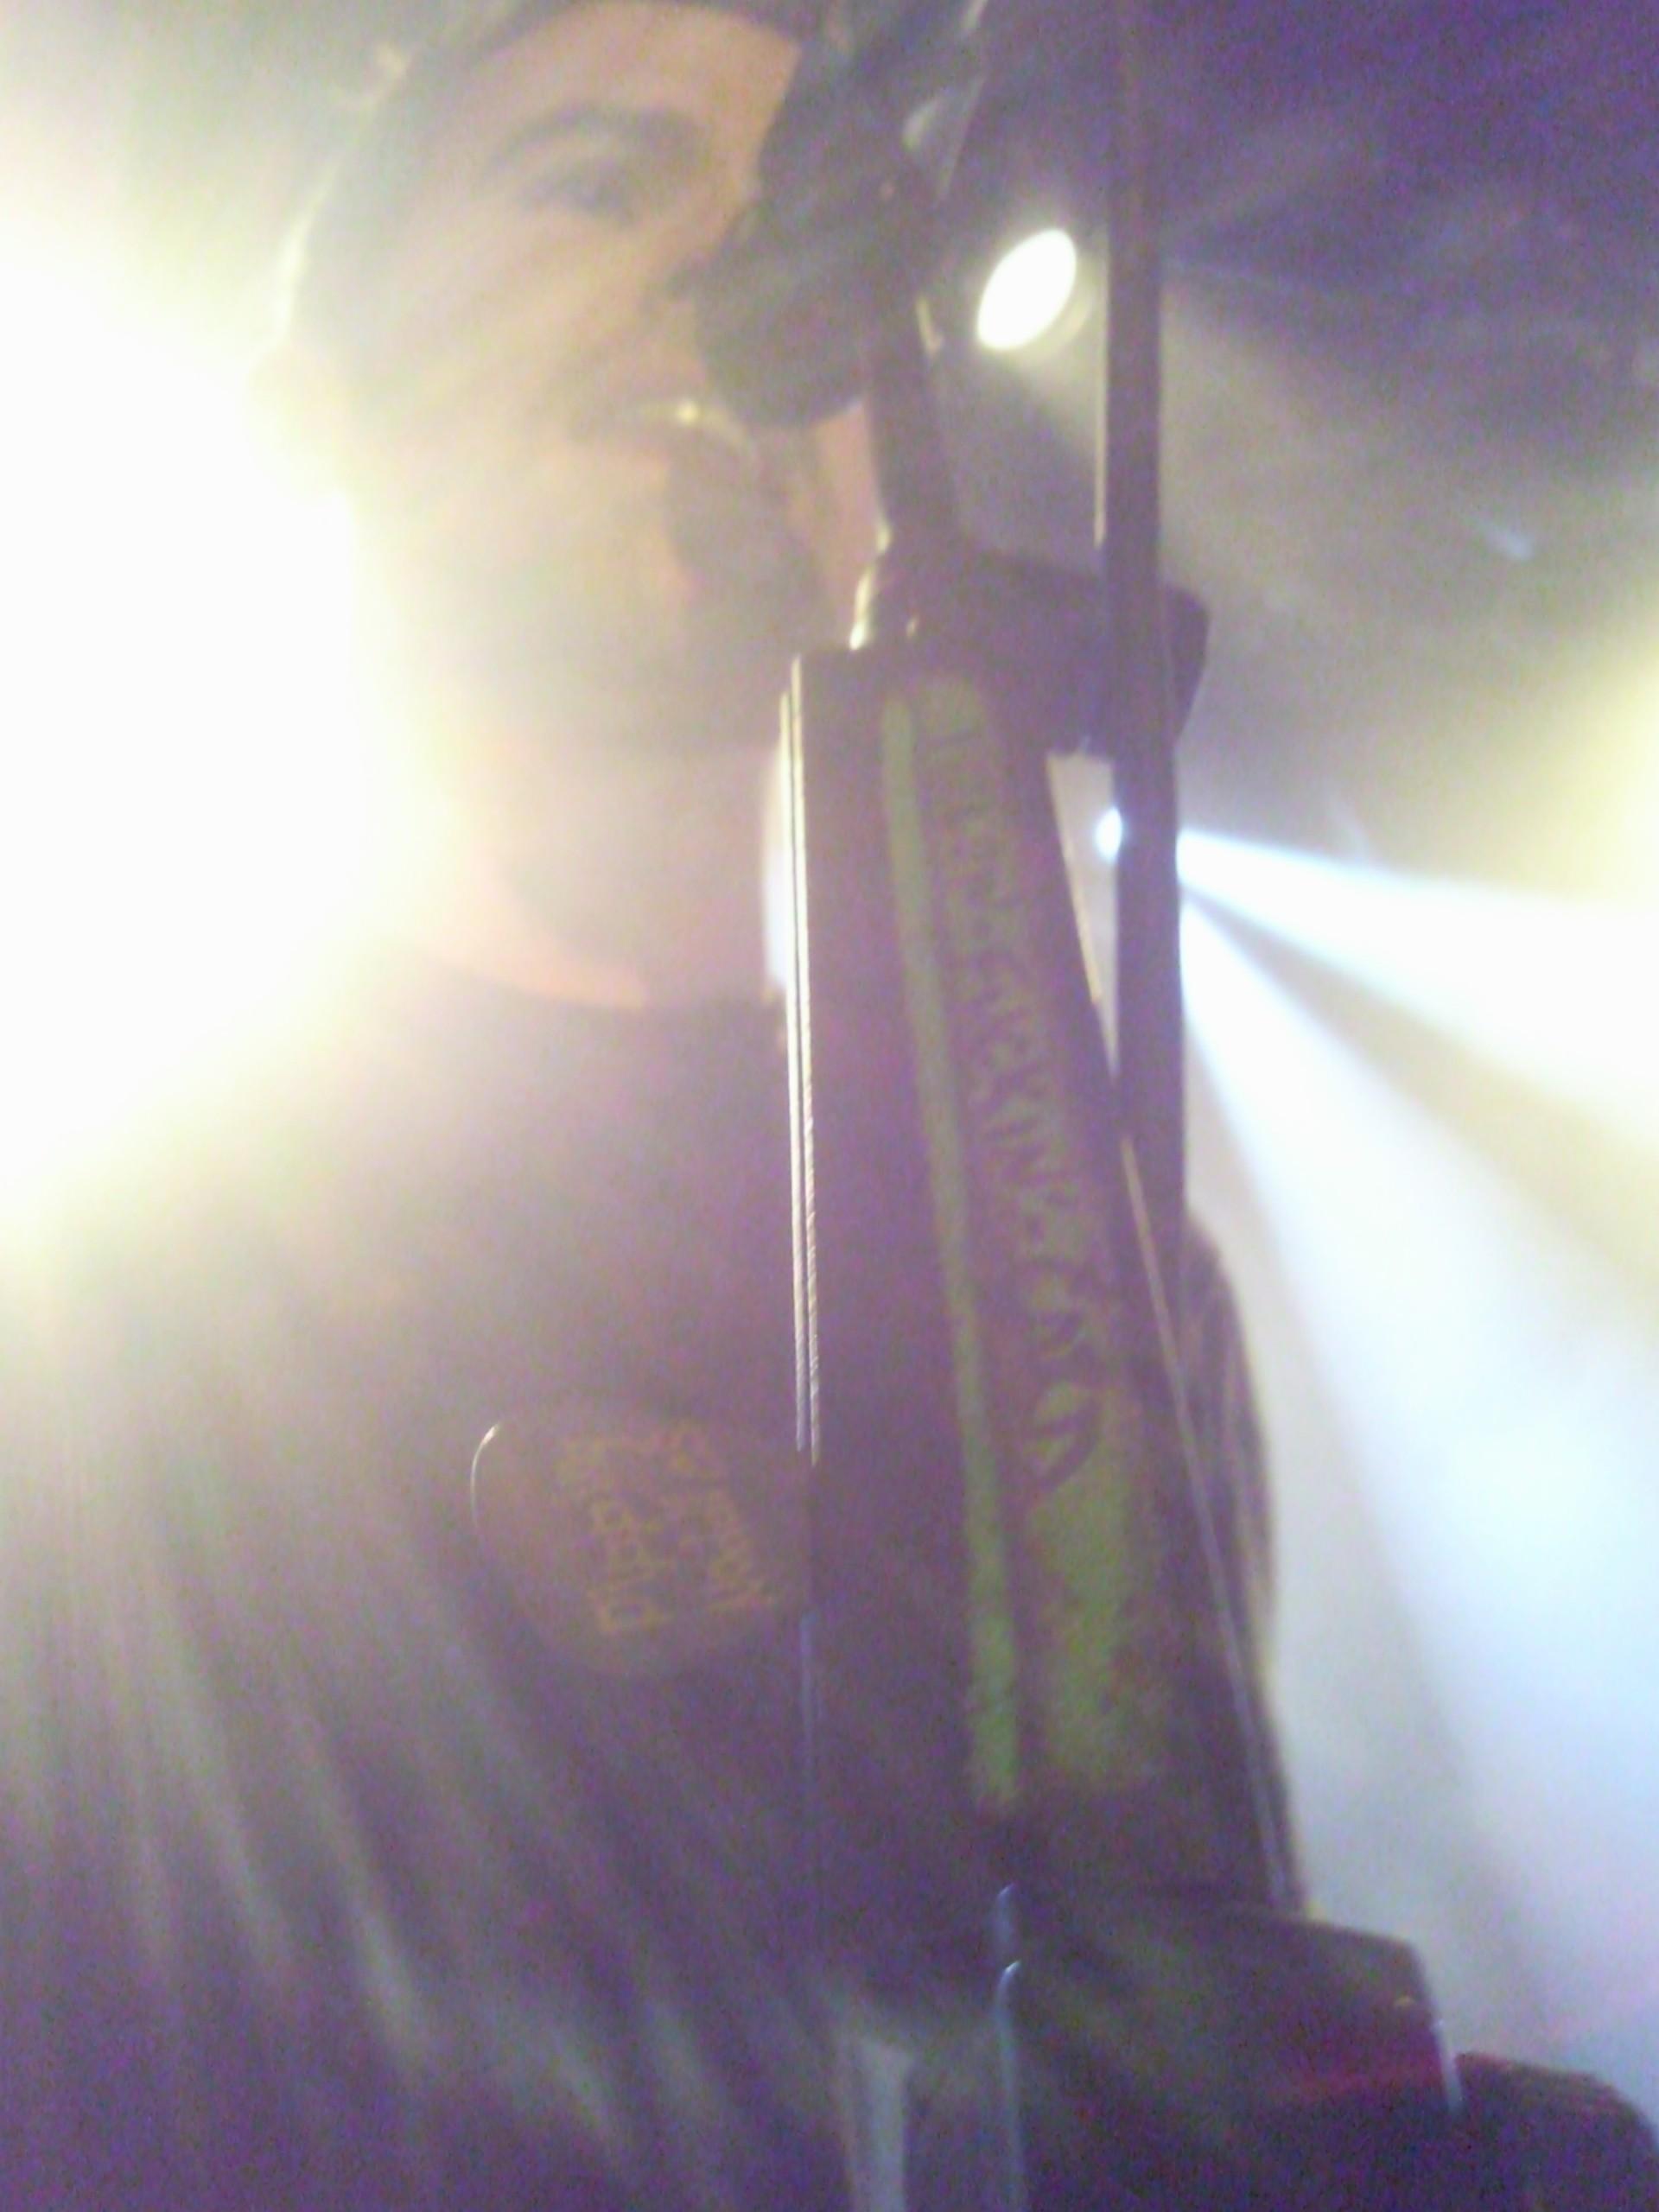 la maroquinerie - [Concert] Yellowcard - La Maroquinerie - 14 décembre photo02011 e1323963596662